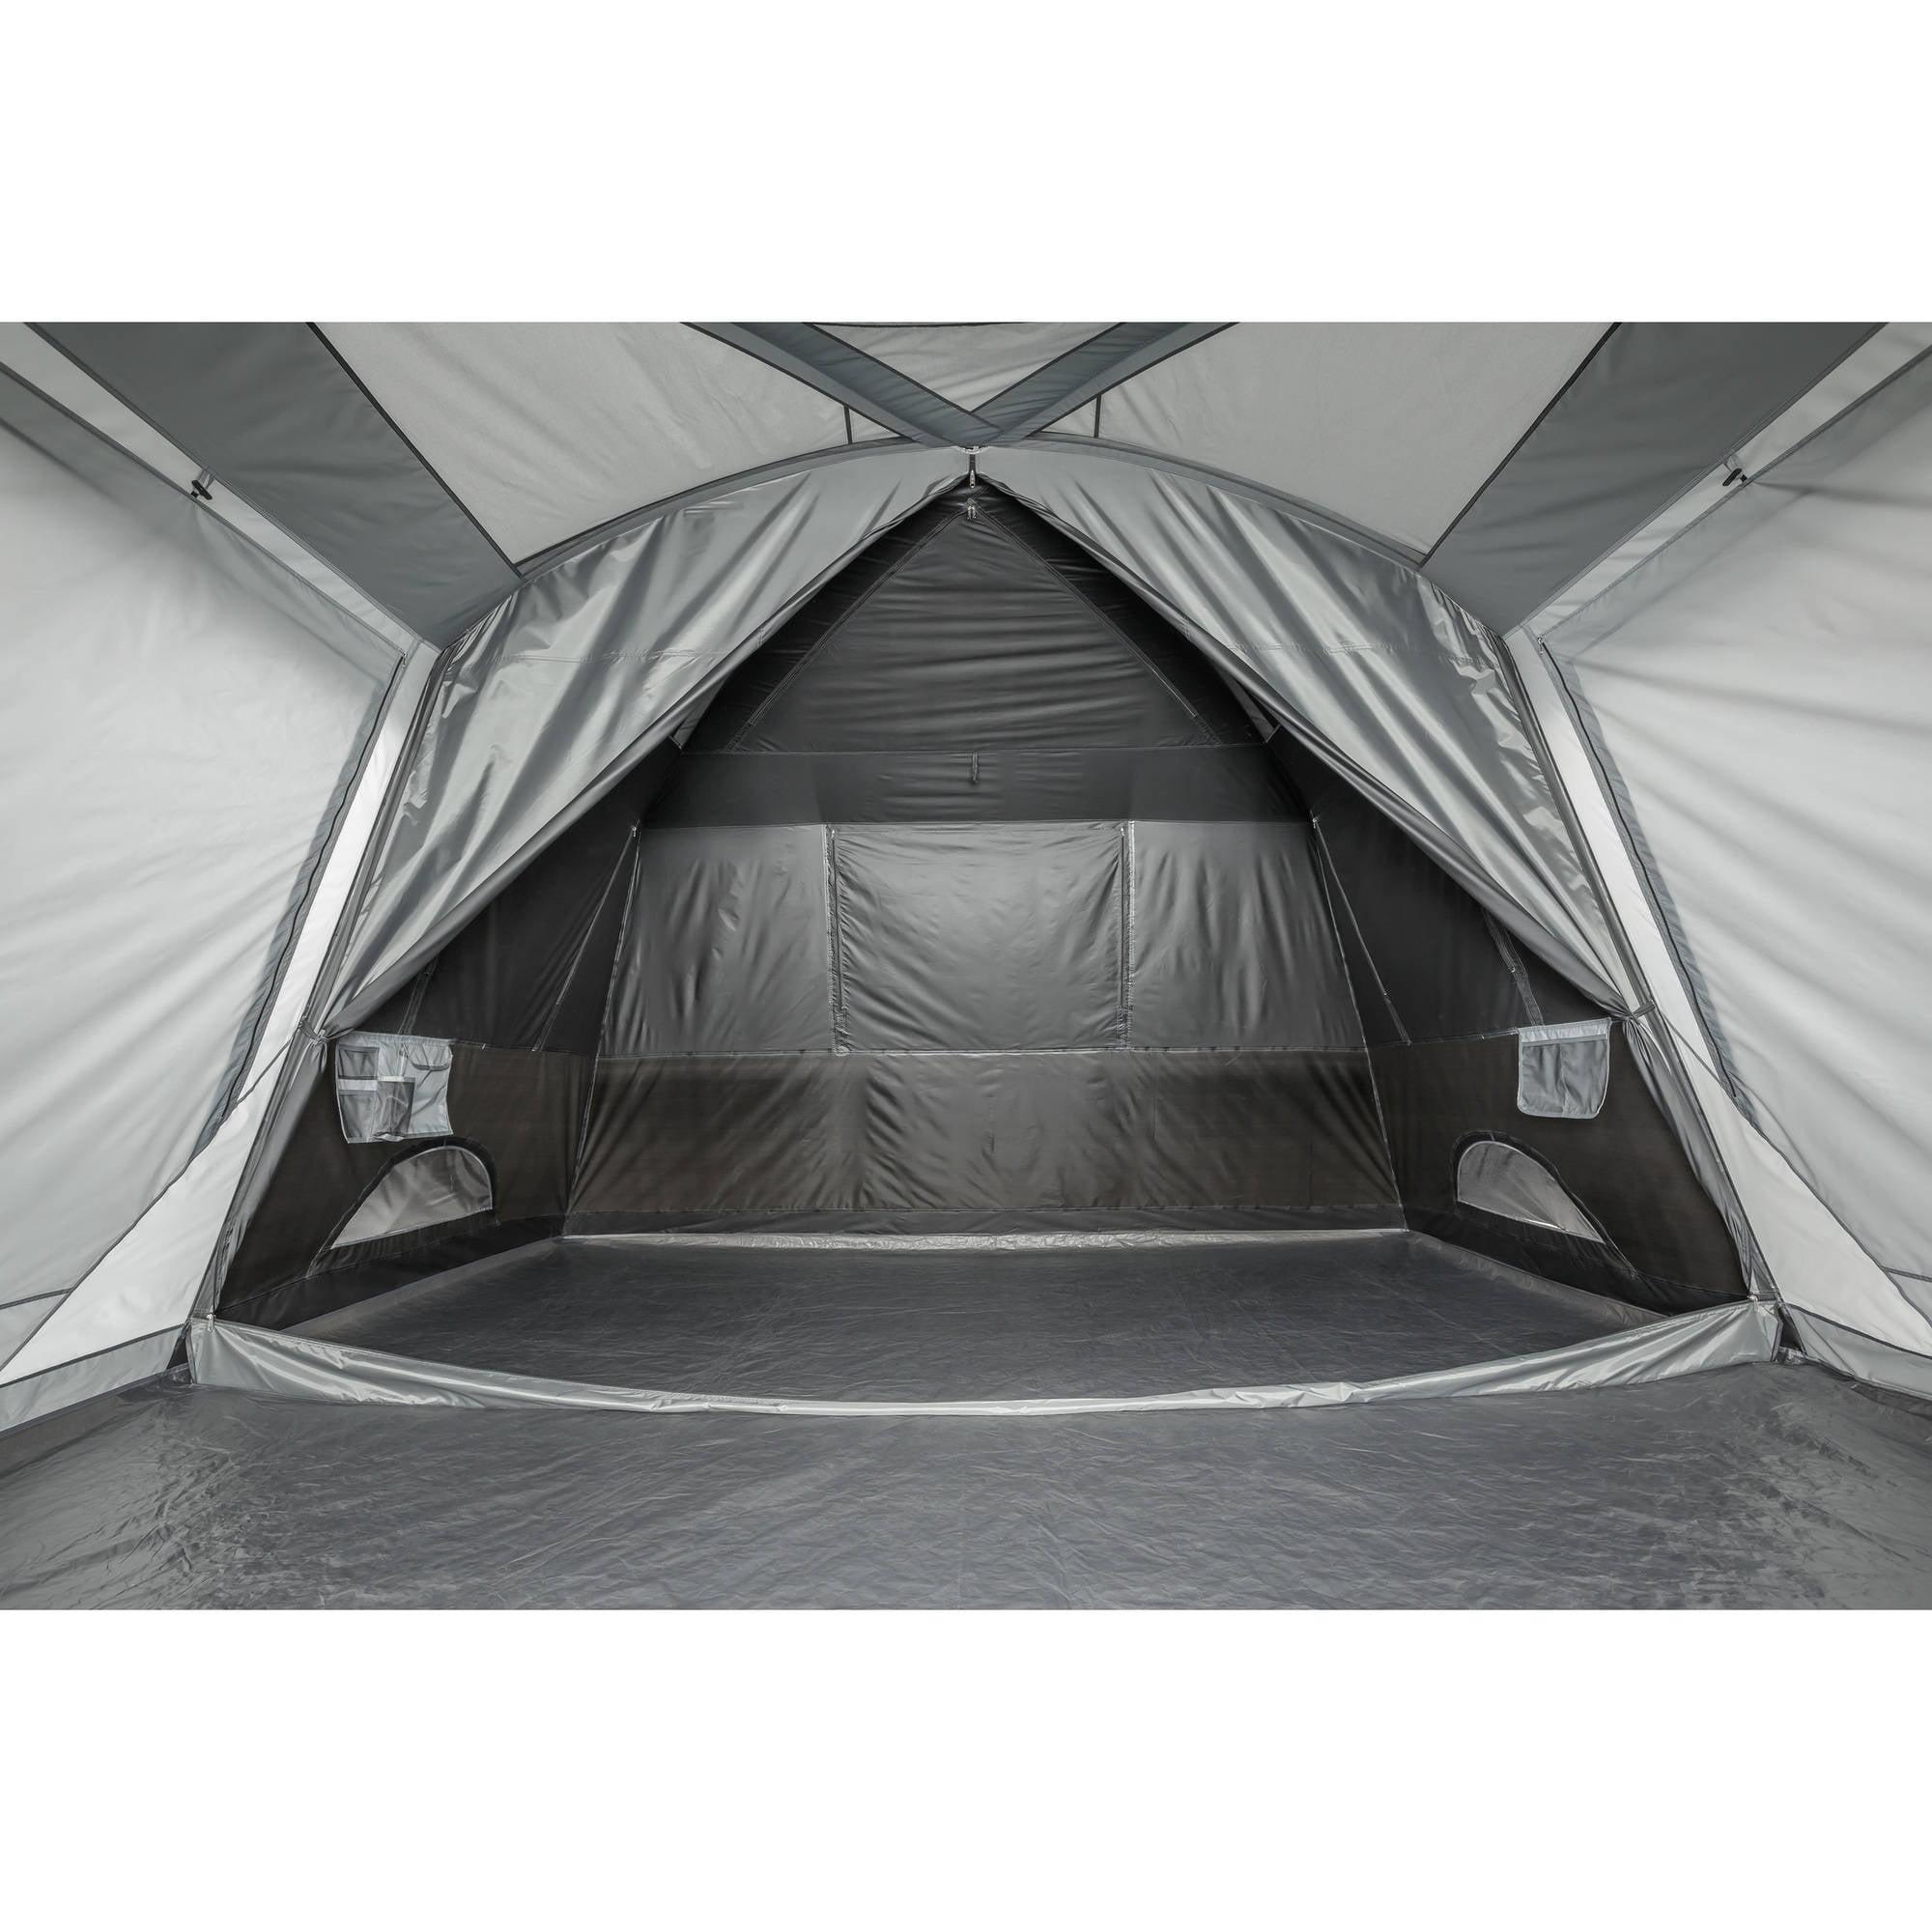 Ozark Trail 14  x 12  Half Dark Rest Frp Cabin Tent ebda7f3a55